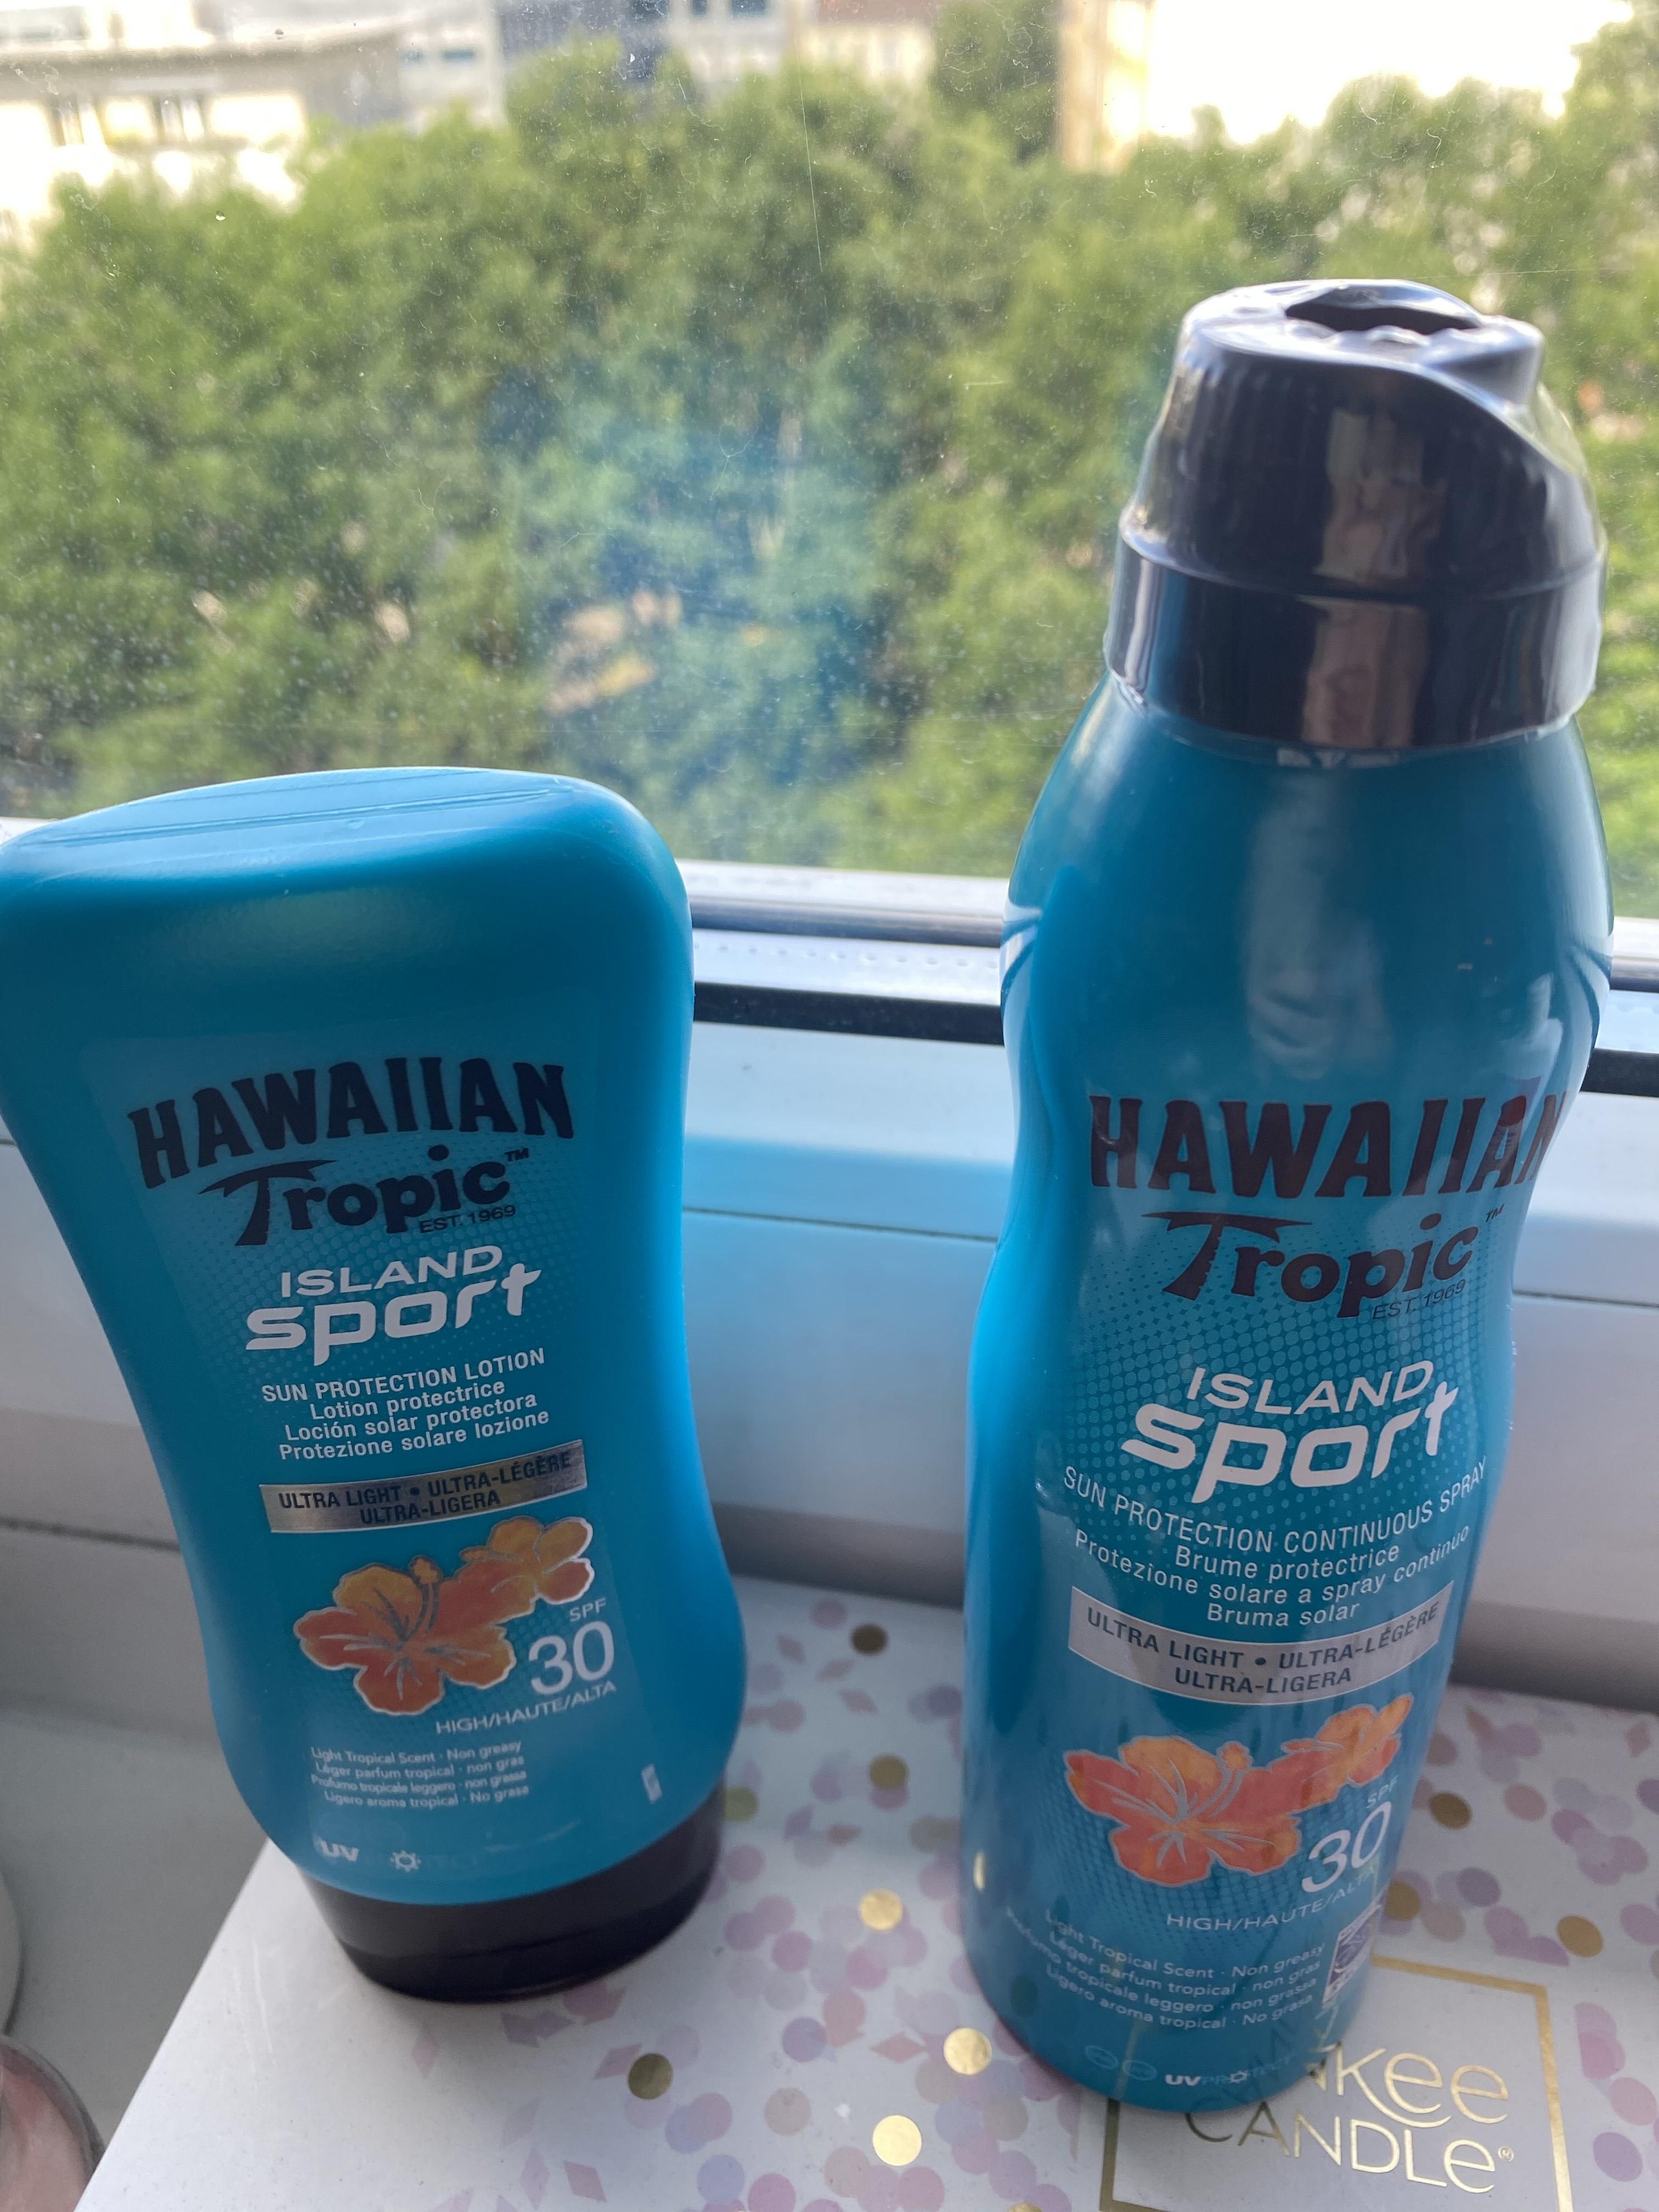 [verm. Lokal- Berlin-Marzahn-DM] Hawaiian Tropic, Island Sport LSF 30